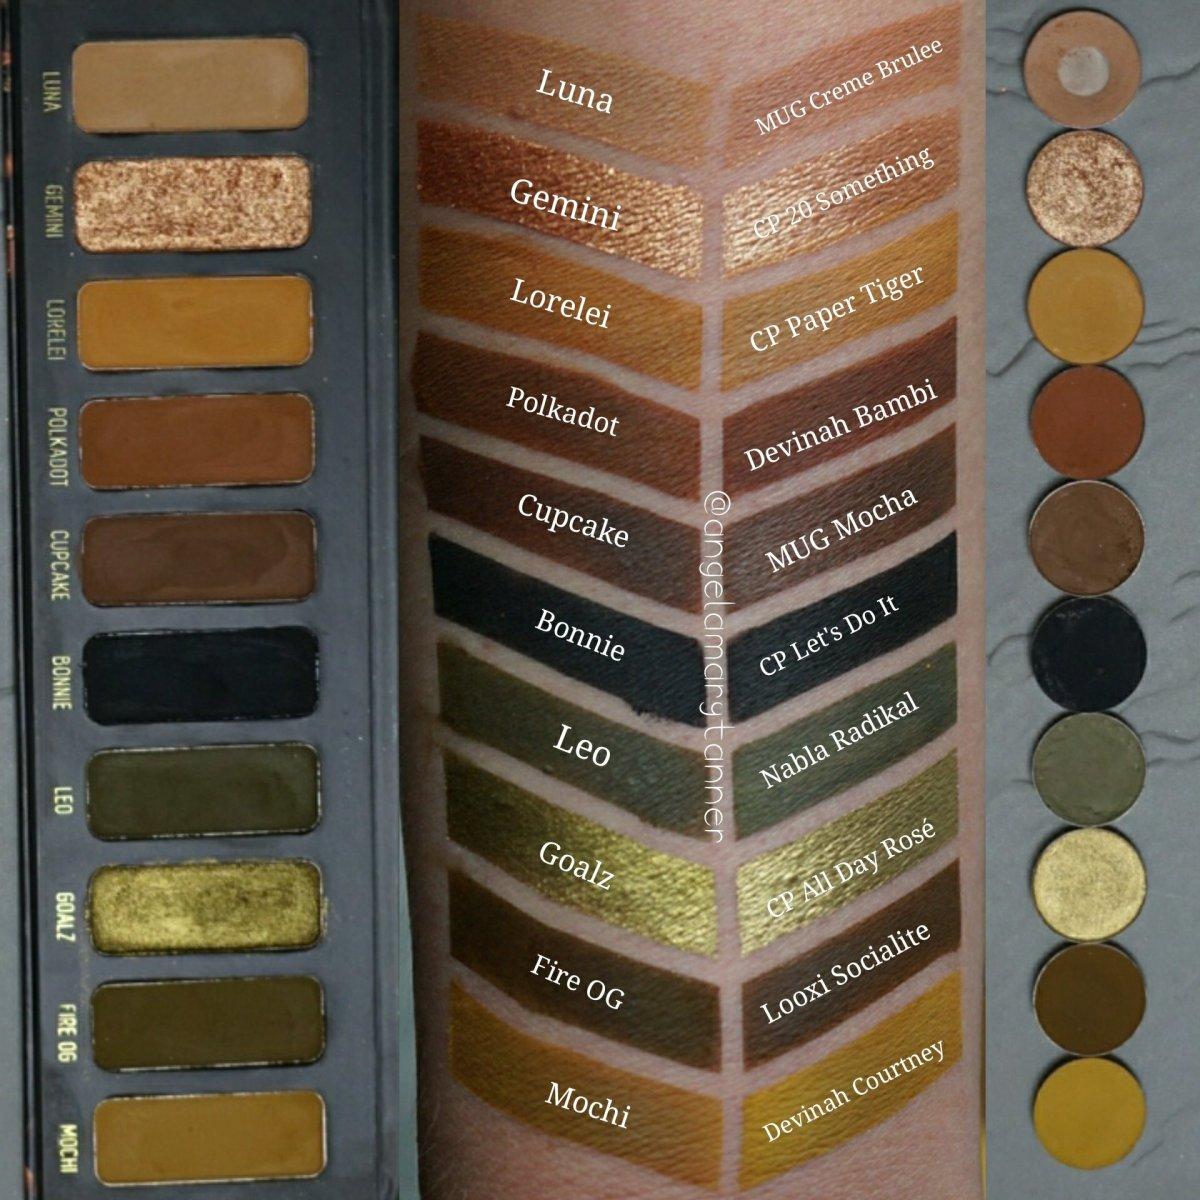 Melt Cosmetics 'Gemini' Palette Dupes!!